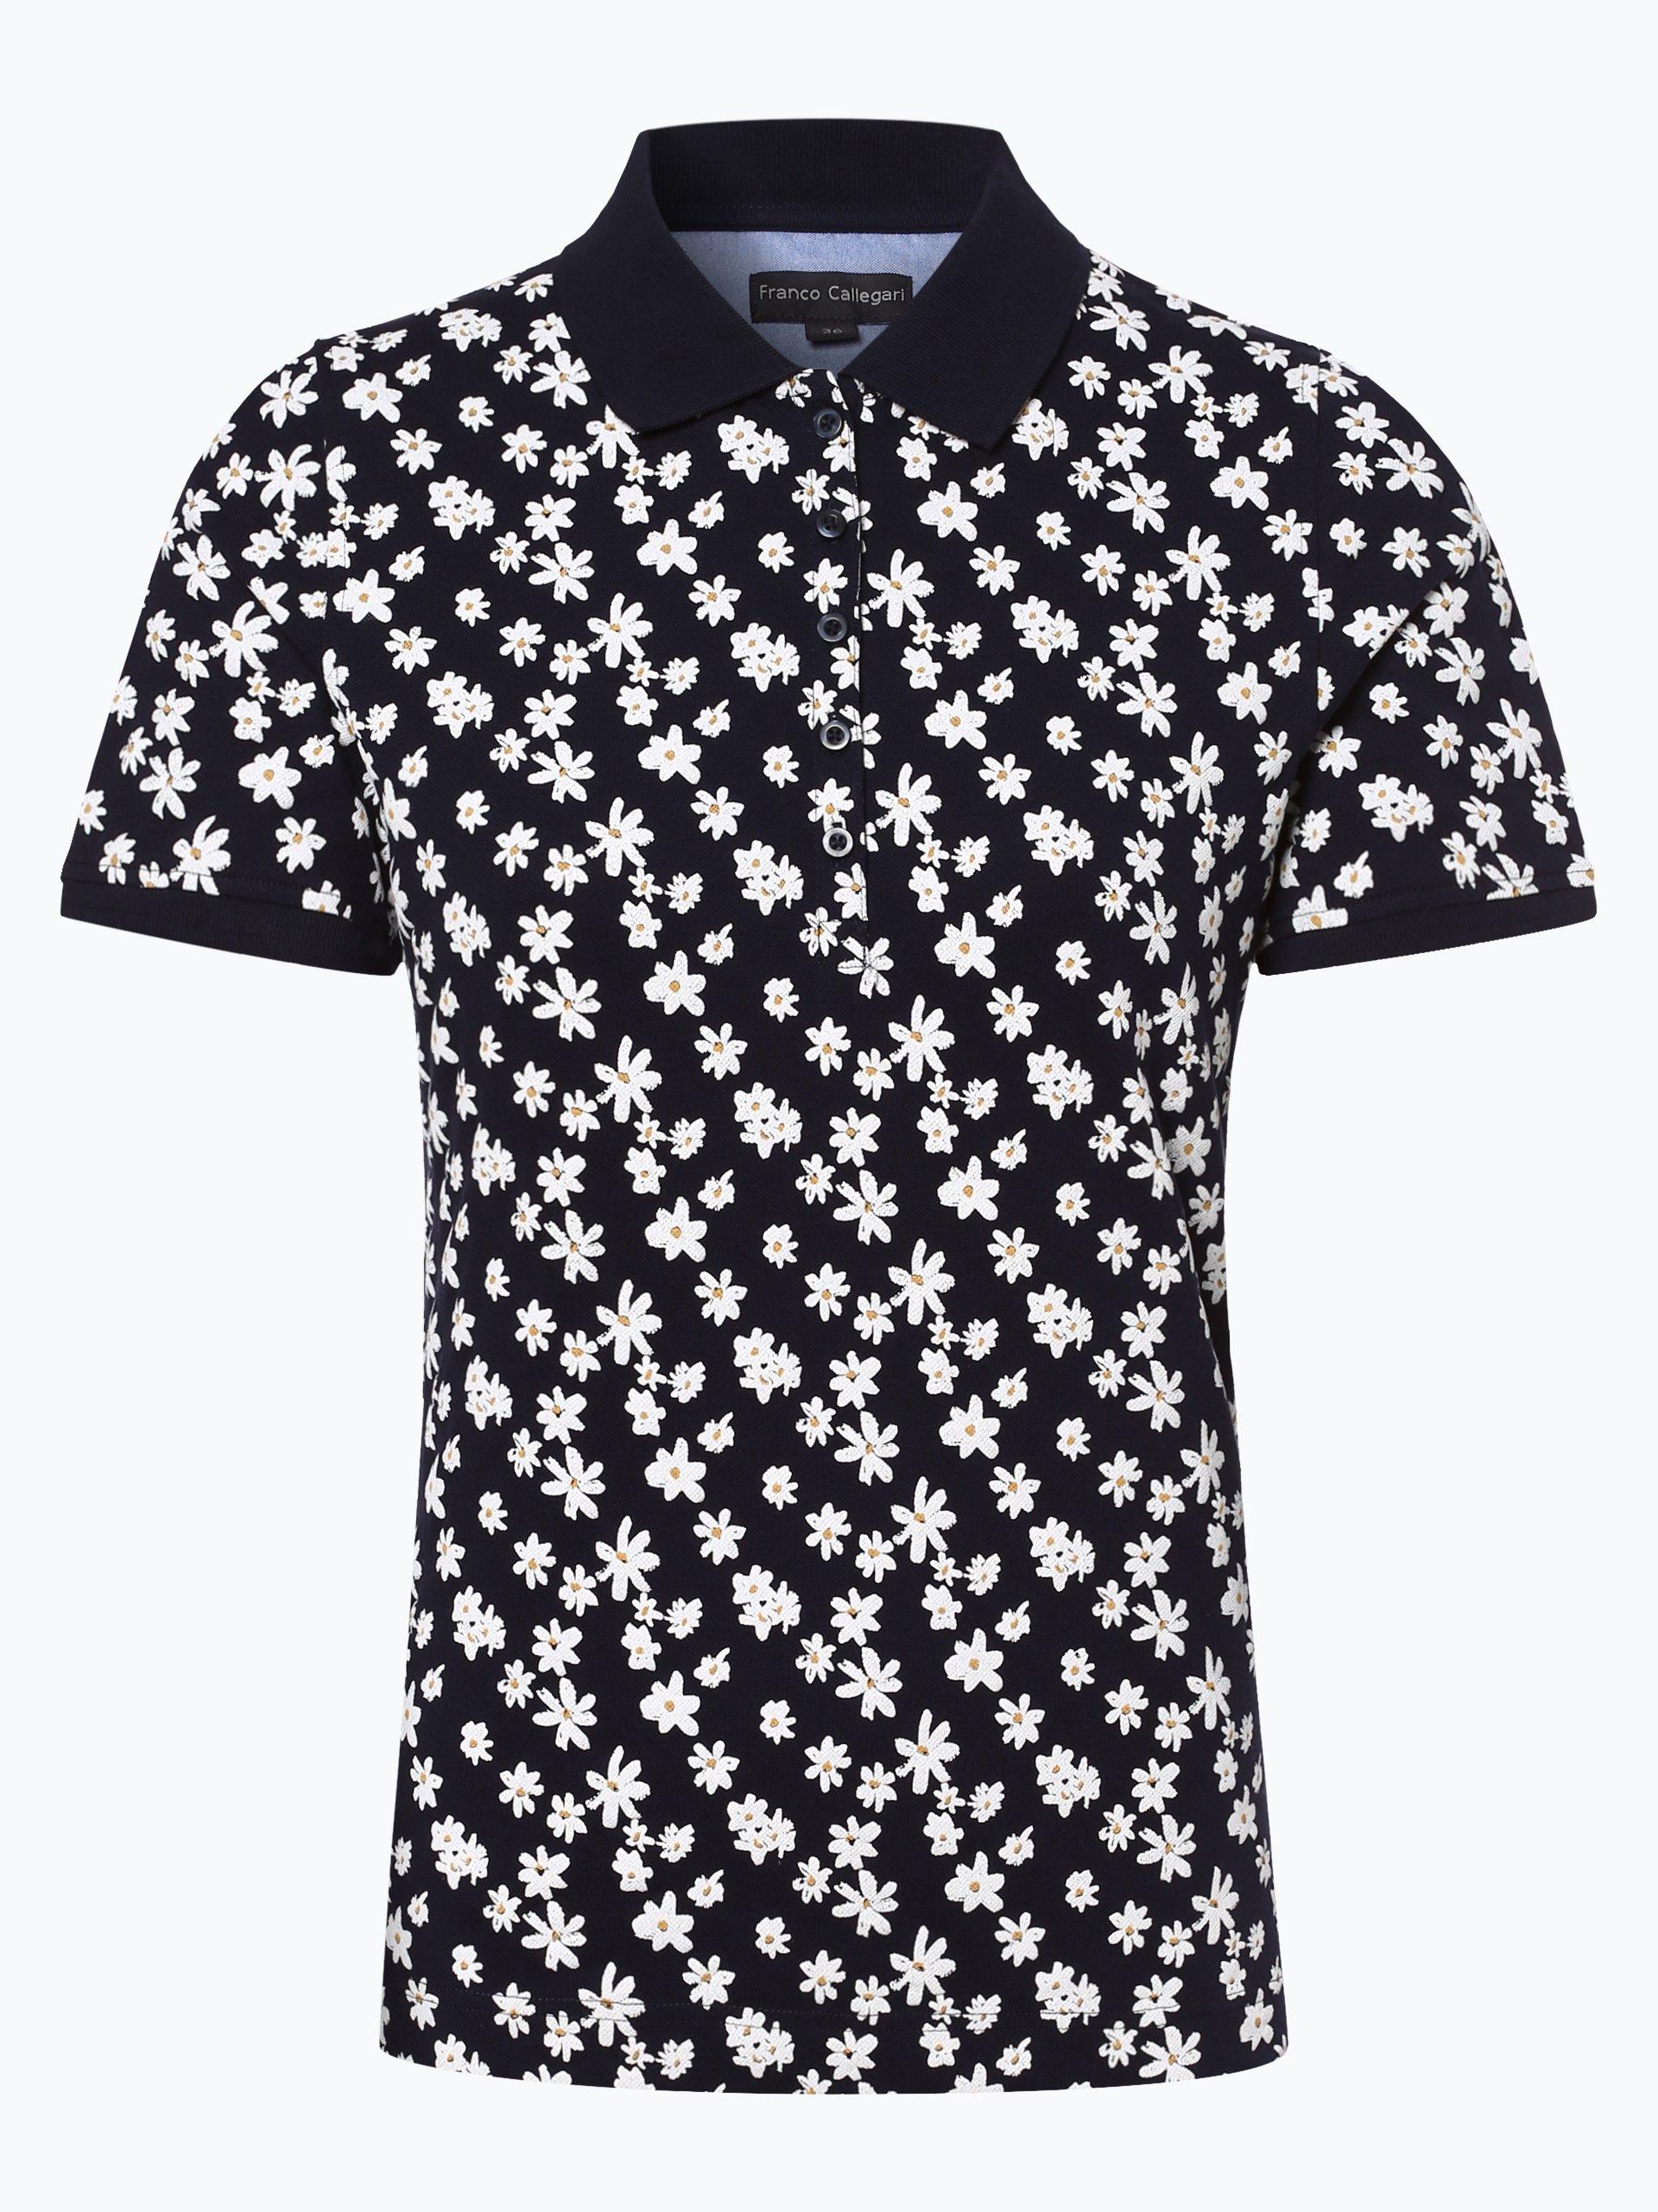 Franco Callegari Damen Poloshirt